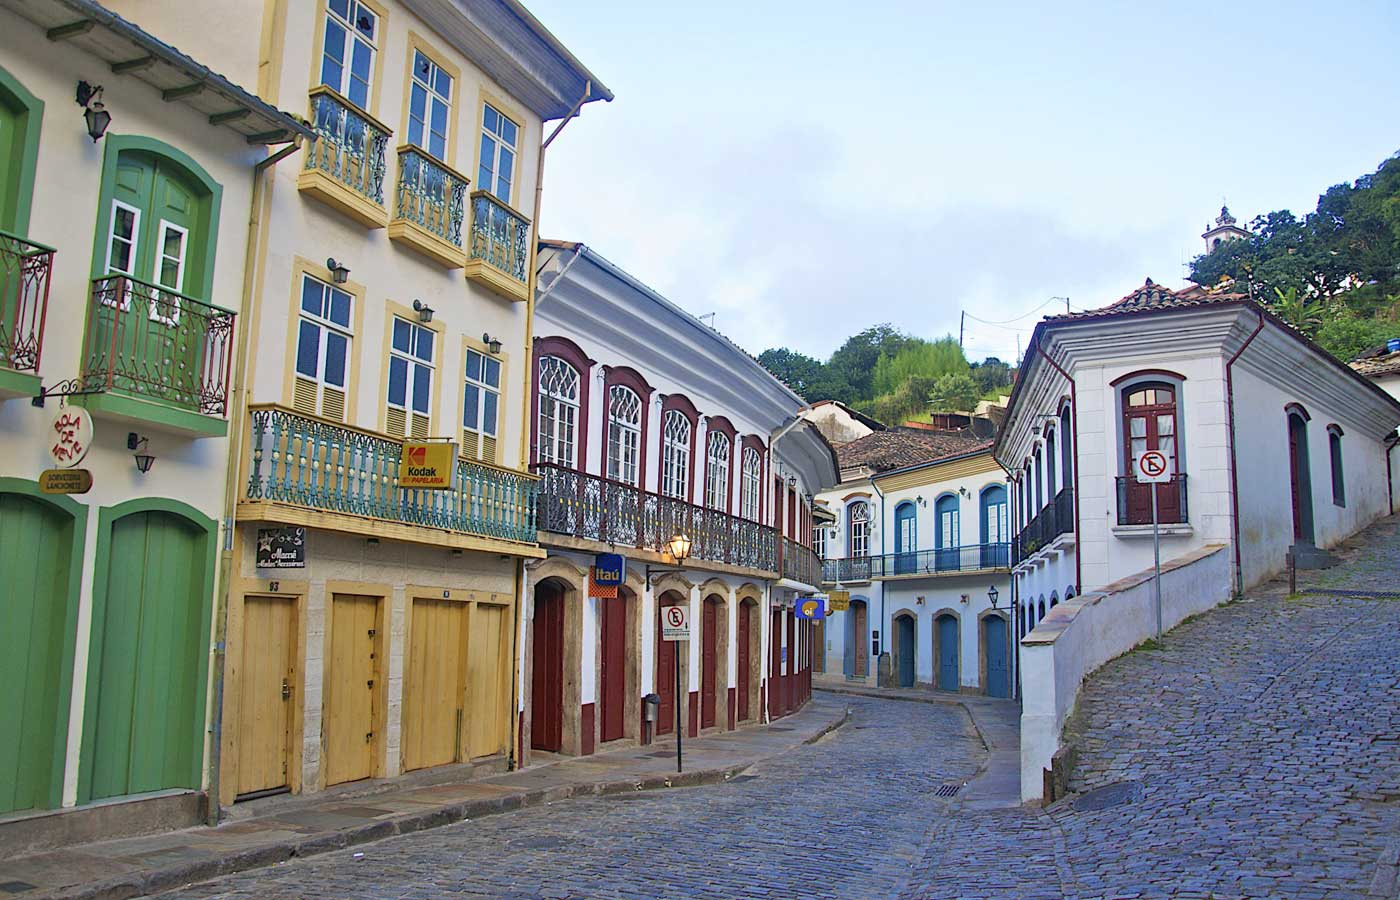 Ouro Preto - Colonial towns in Minas Gerais, Brazil